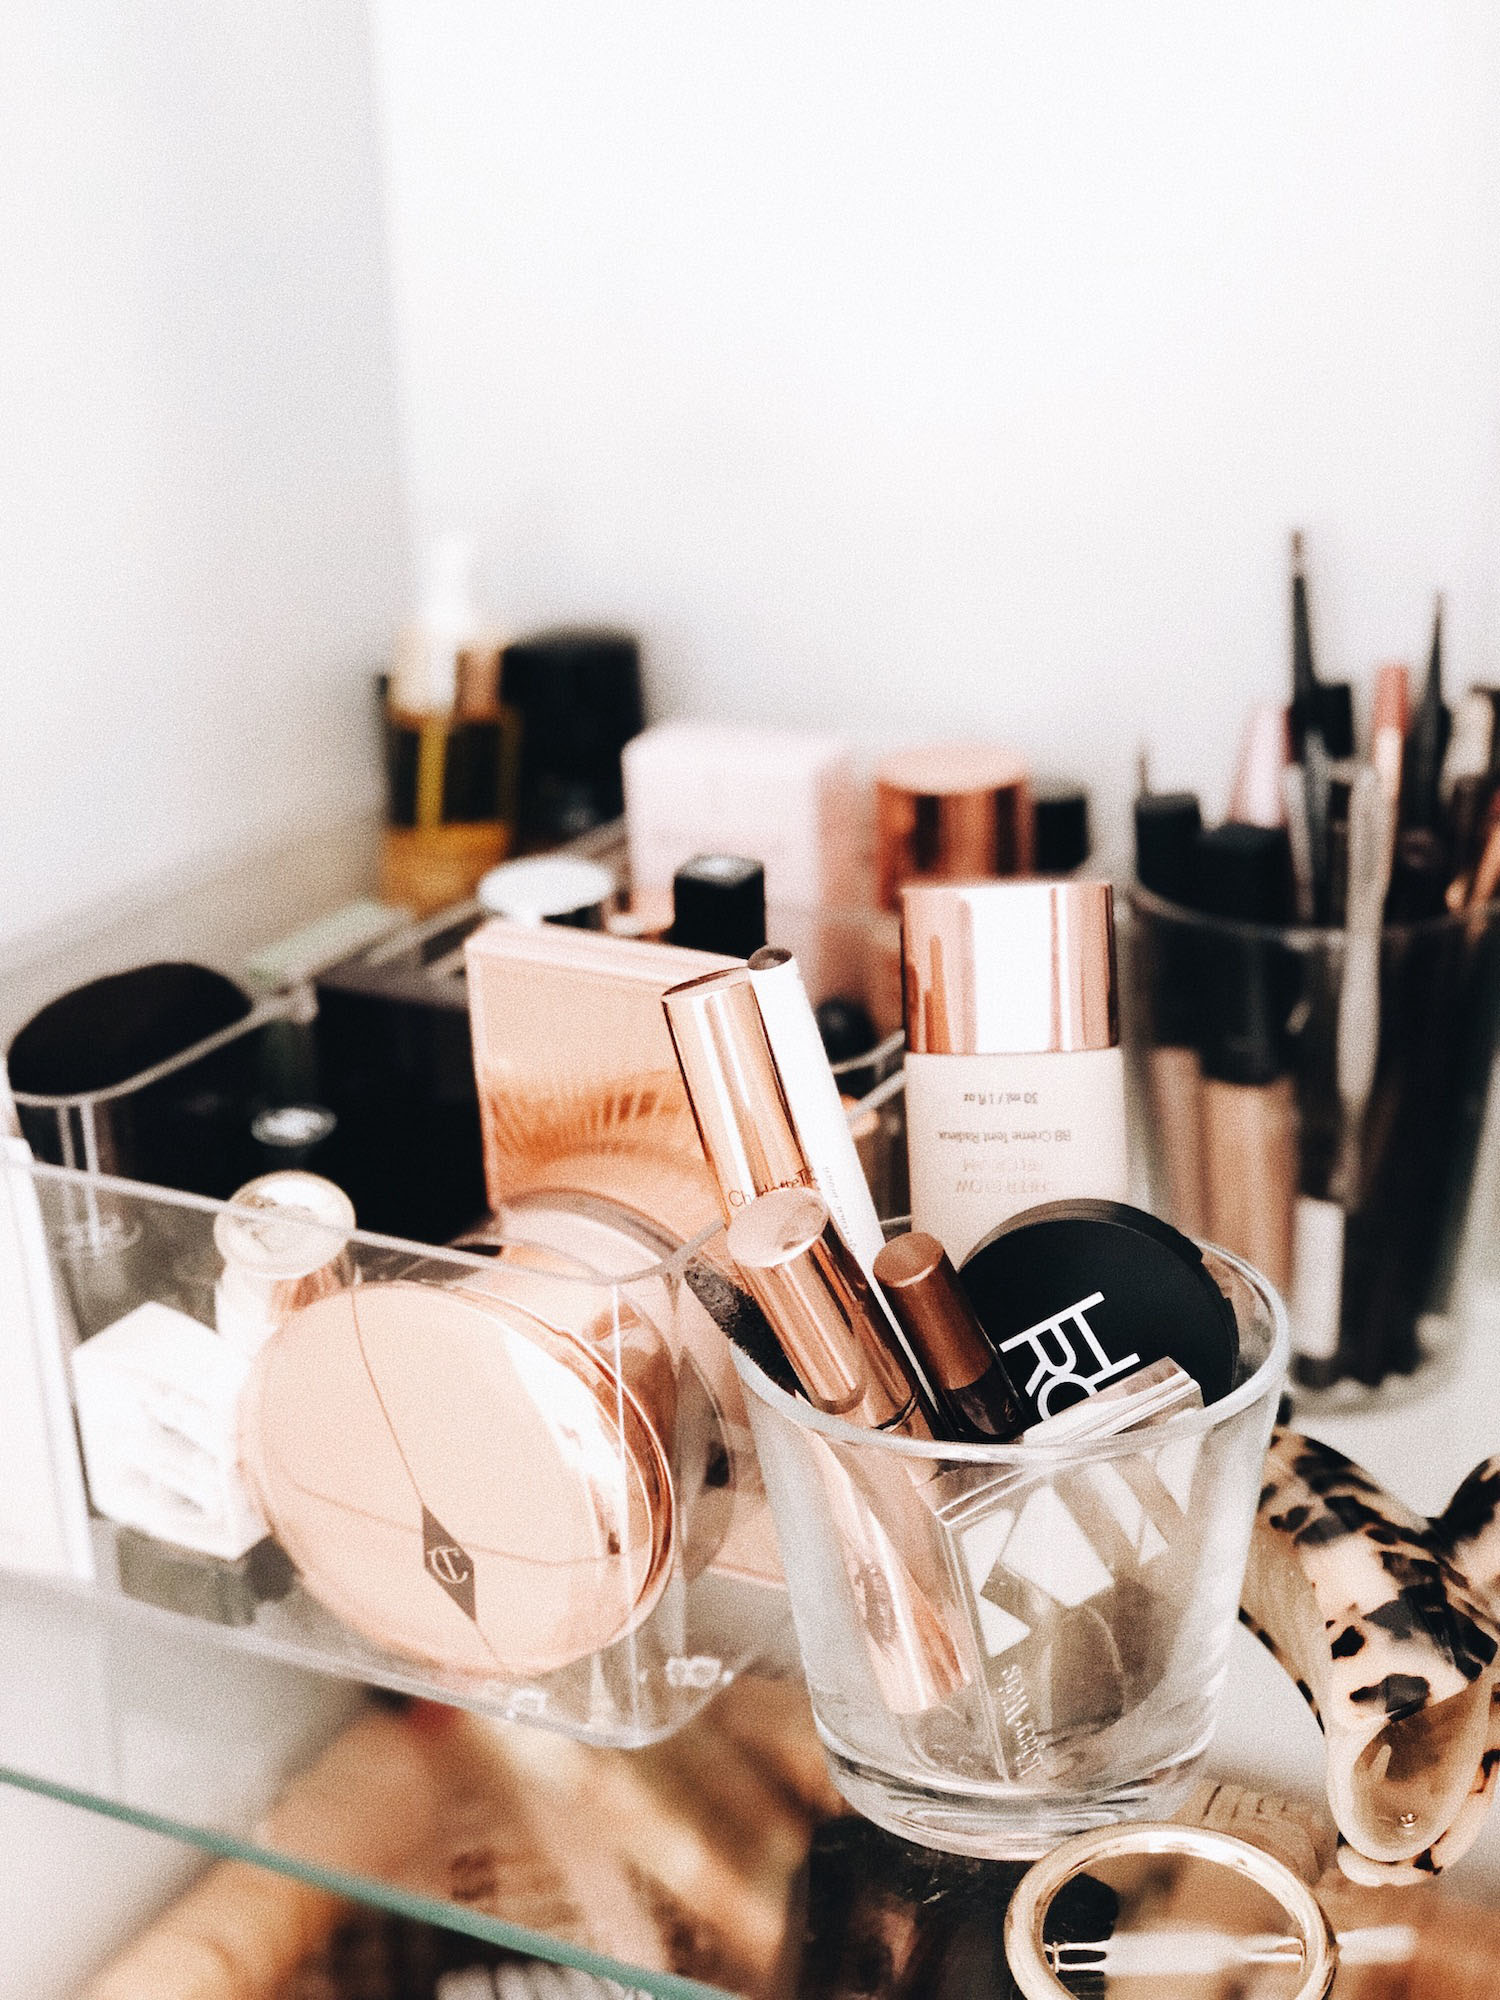 Beautyblog-Beauty-Routine-Neele-Hofmann